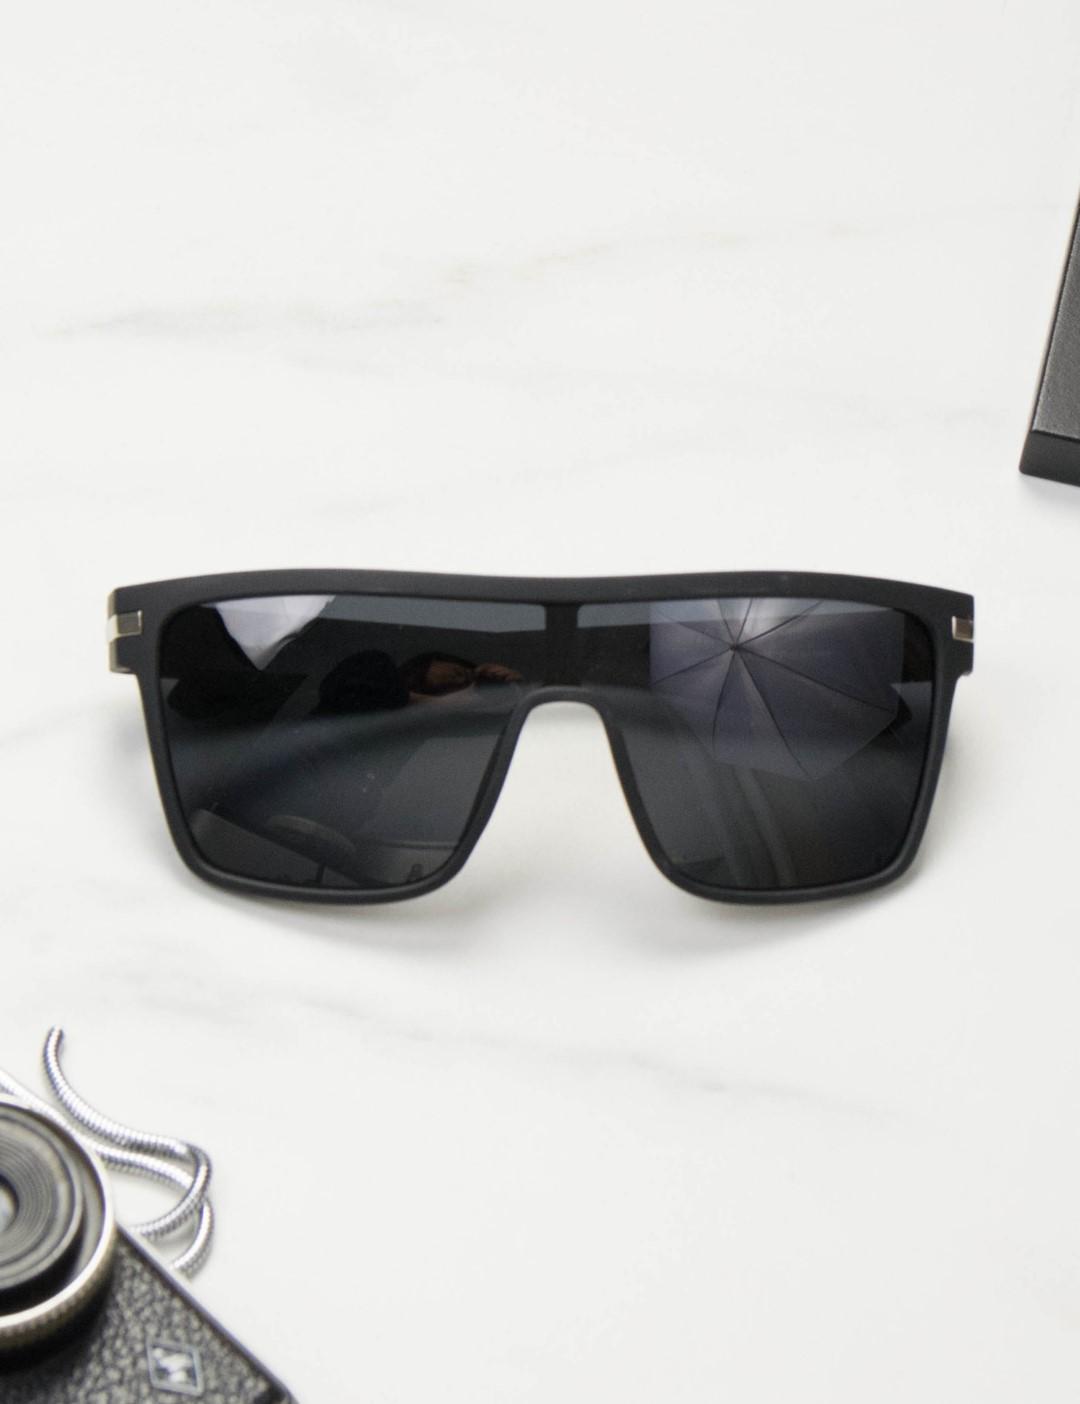 a051ff98c5 Ανδρικά μαύρα τετράγωνα γυαλιά ηλίου Polarized S2064S